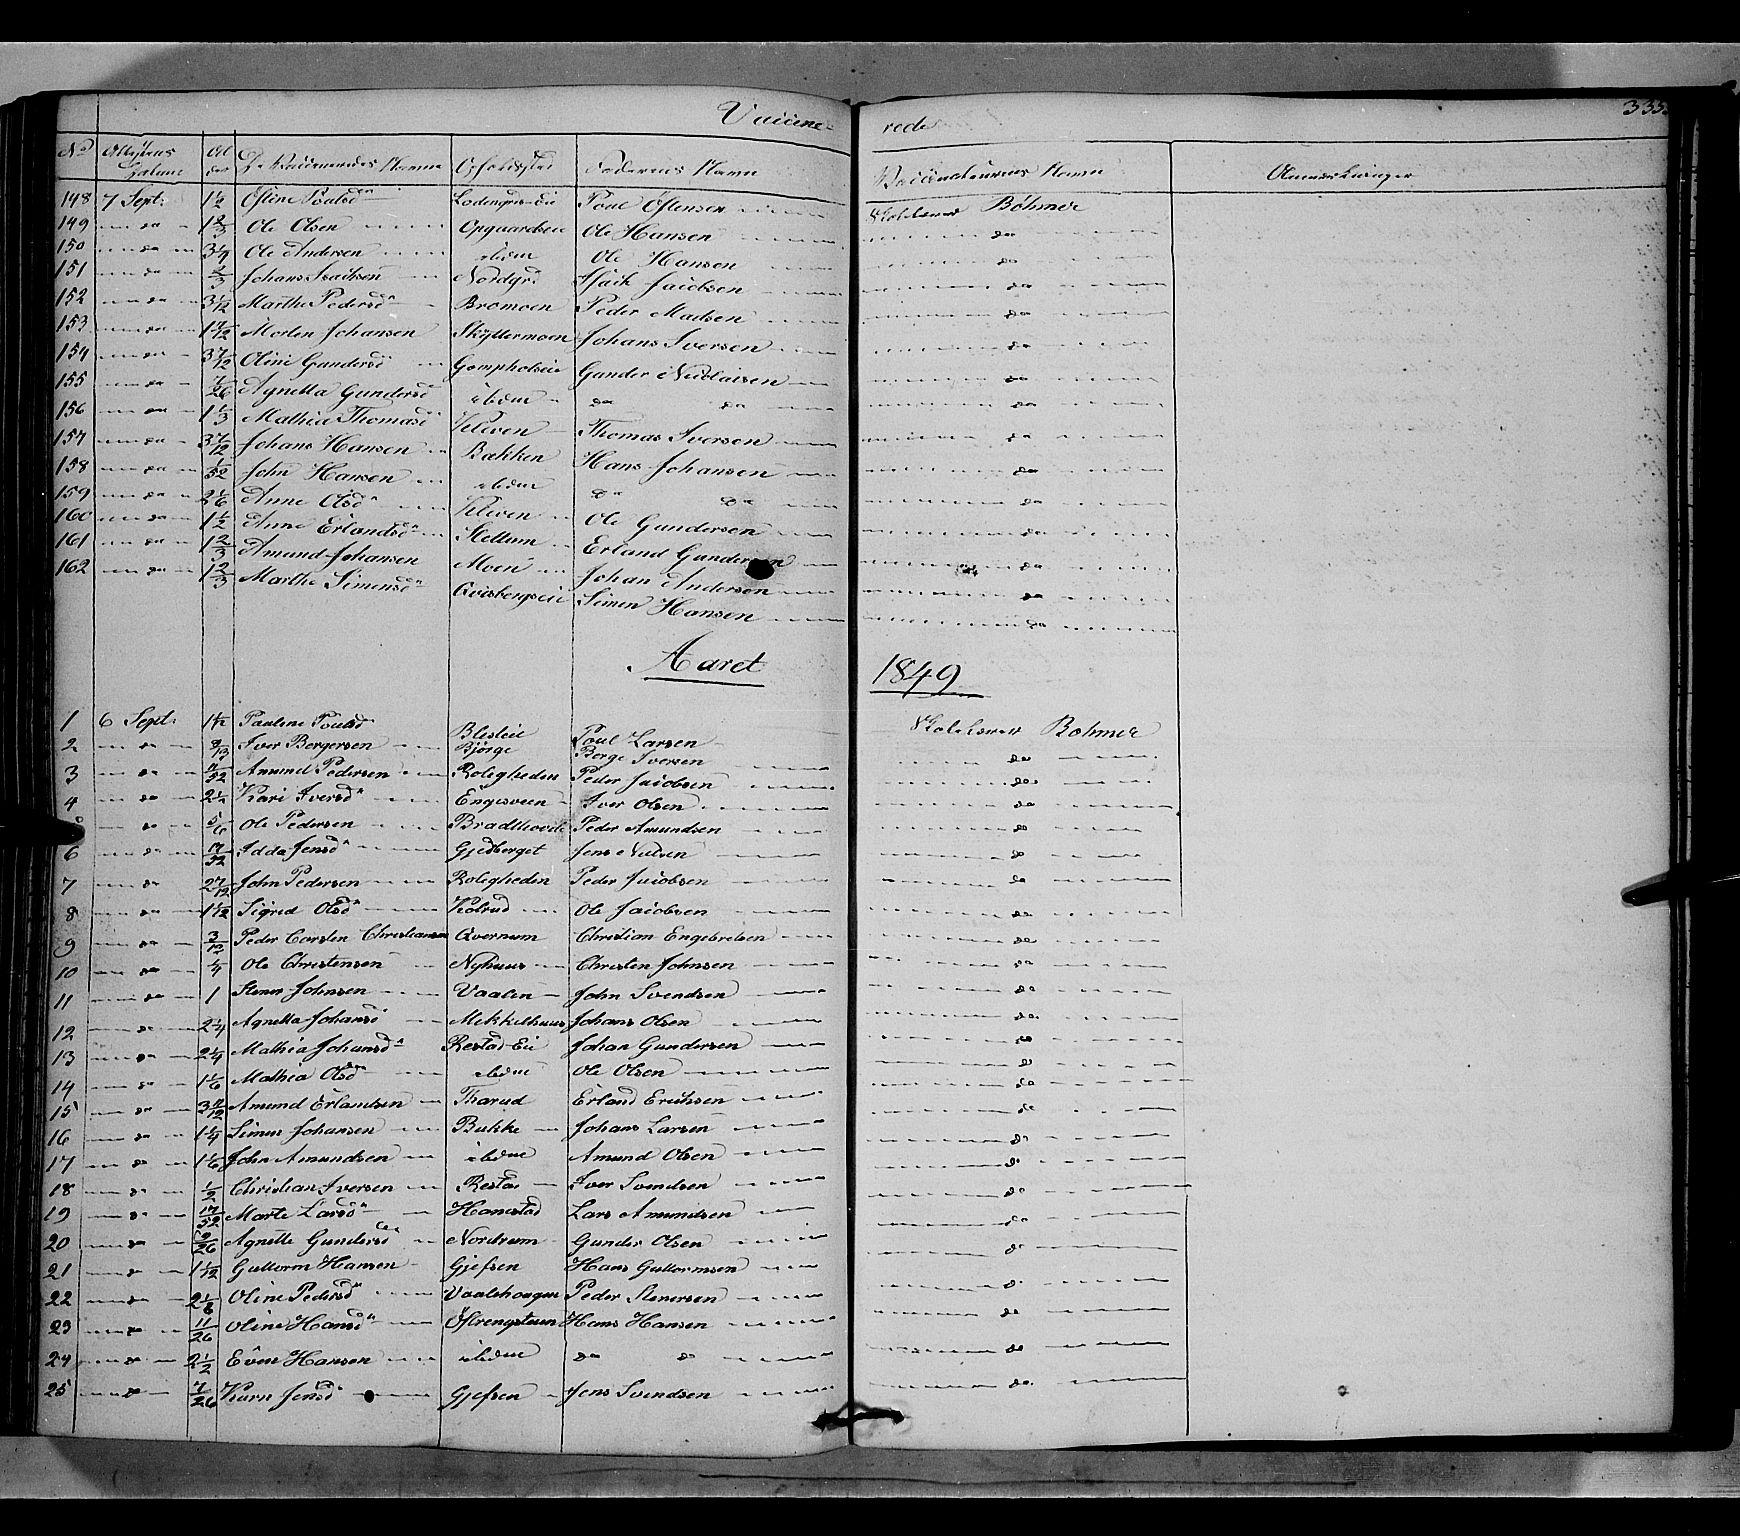 SAH, Gausdal prestekontor, Ministerialbok nr. 7, 1840-1850, s. 335